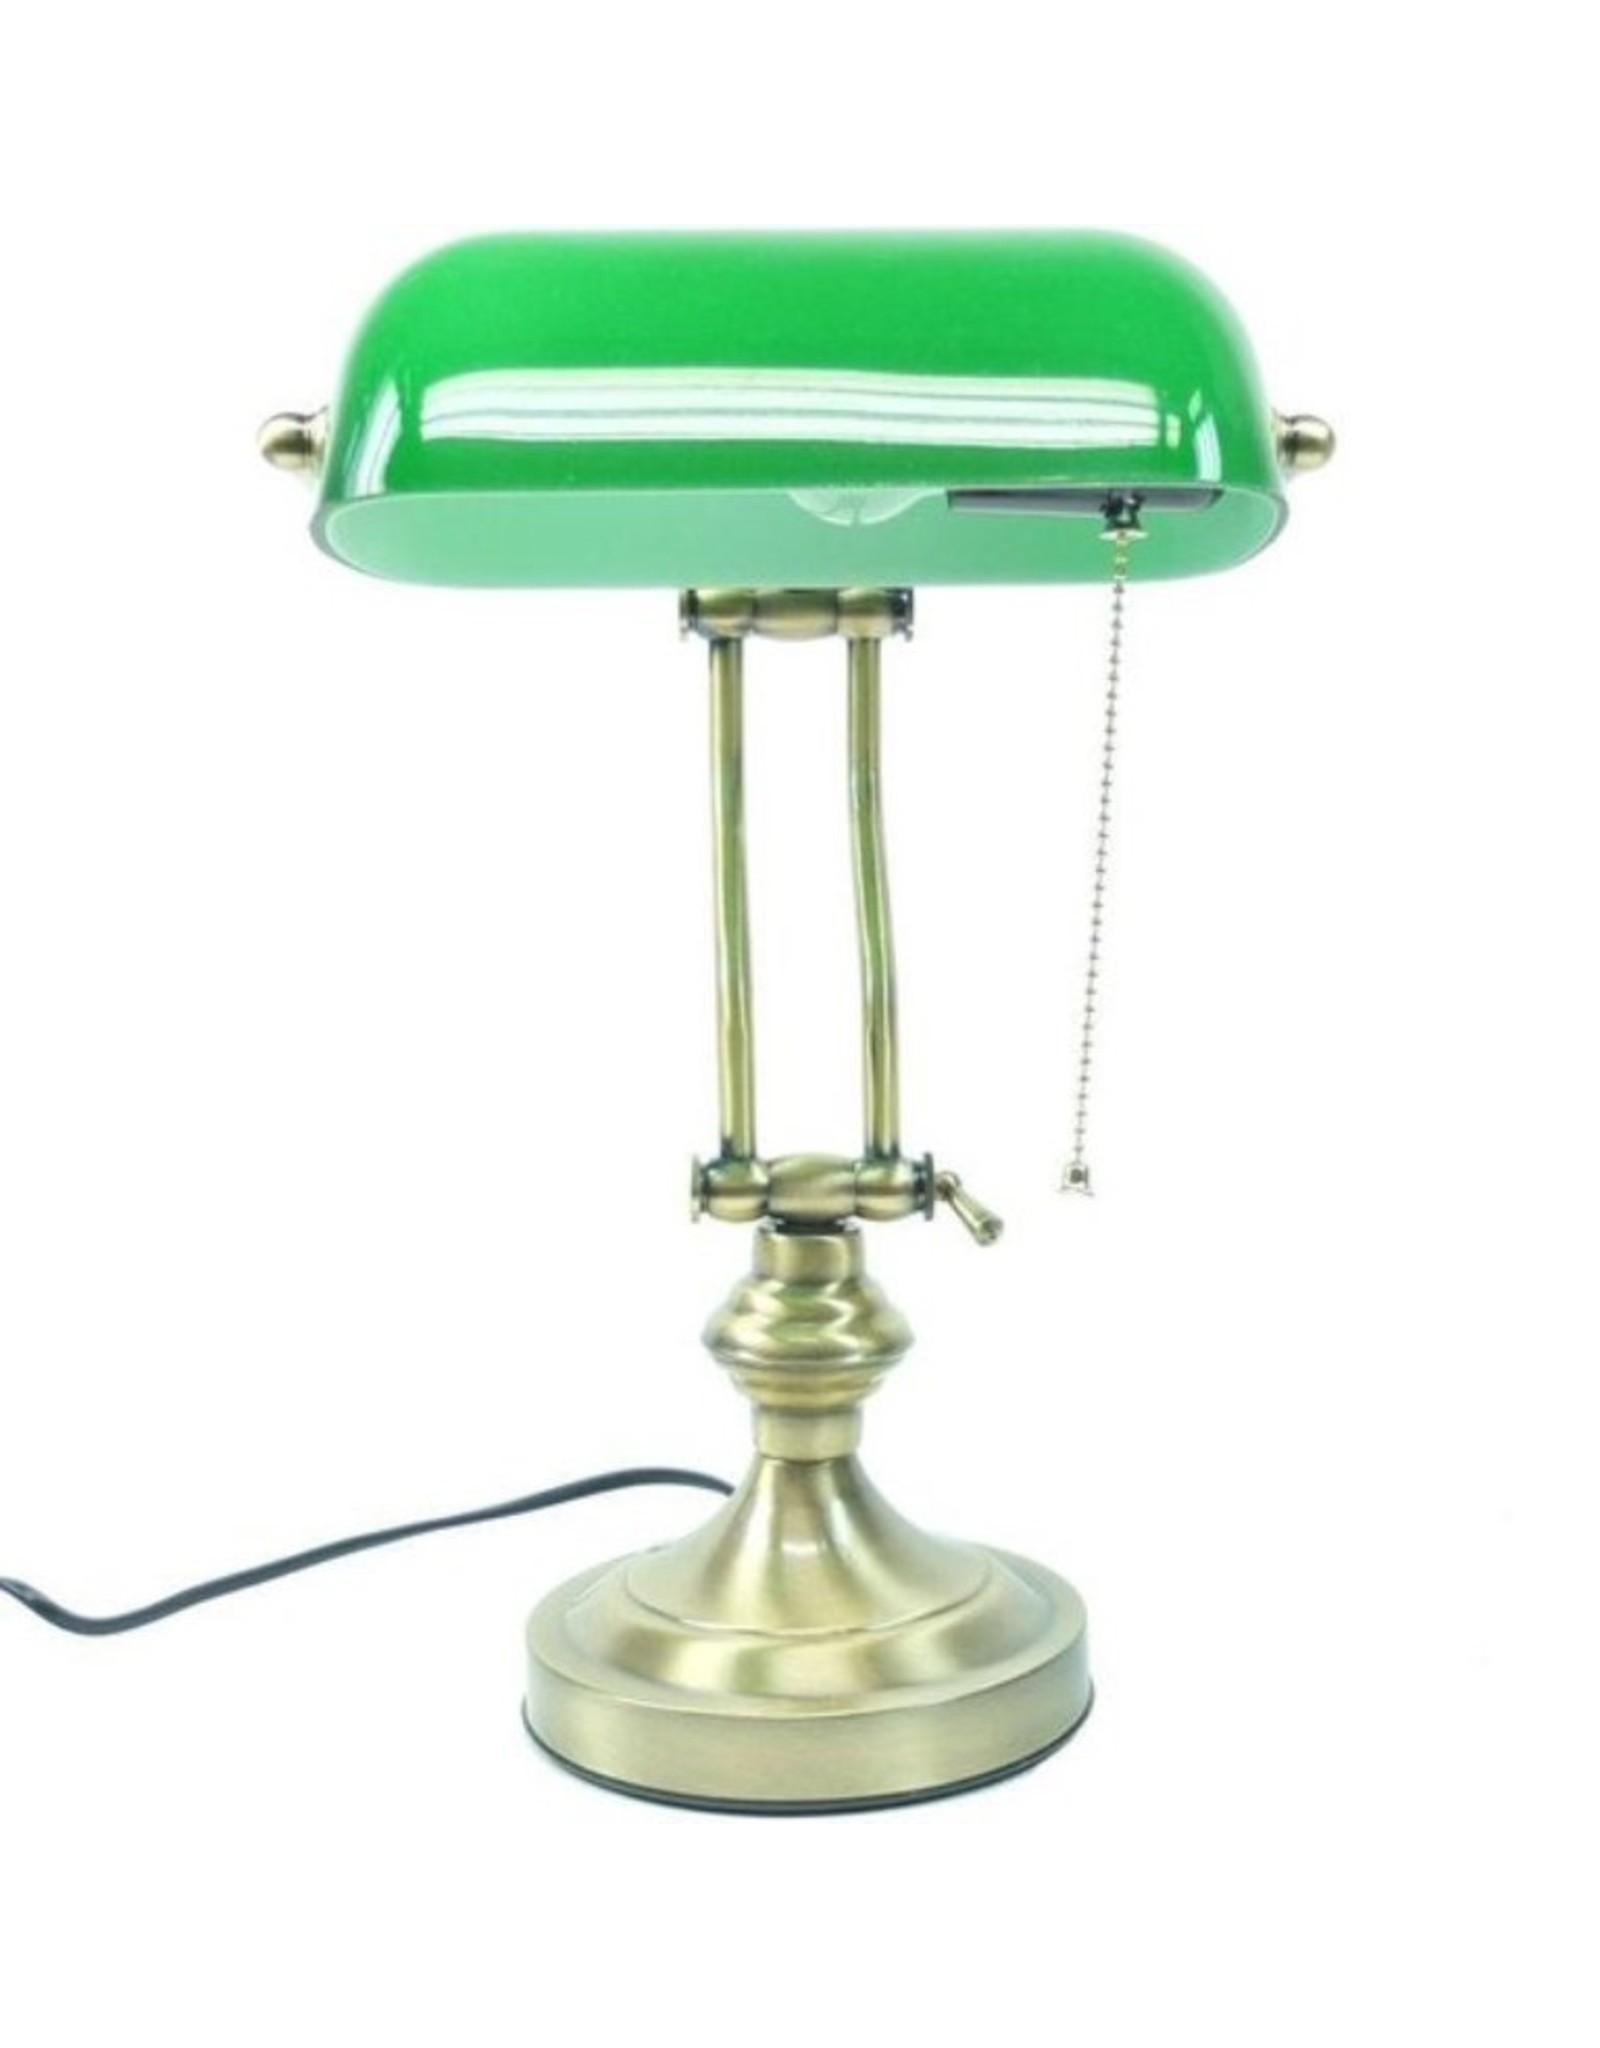 Klassieke tafellamp Art Deco Miscellaneous - Bankierslamp met groene glazen kap Art deco